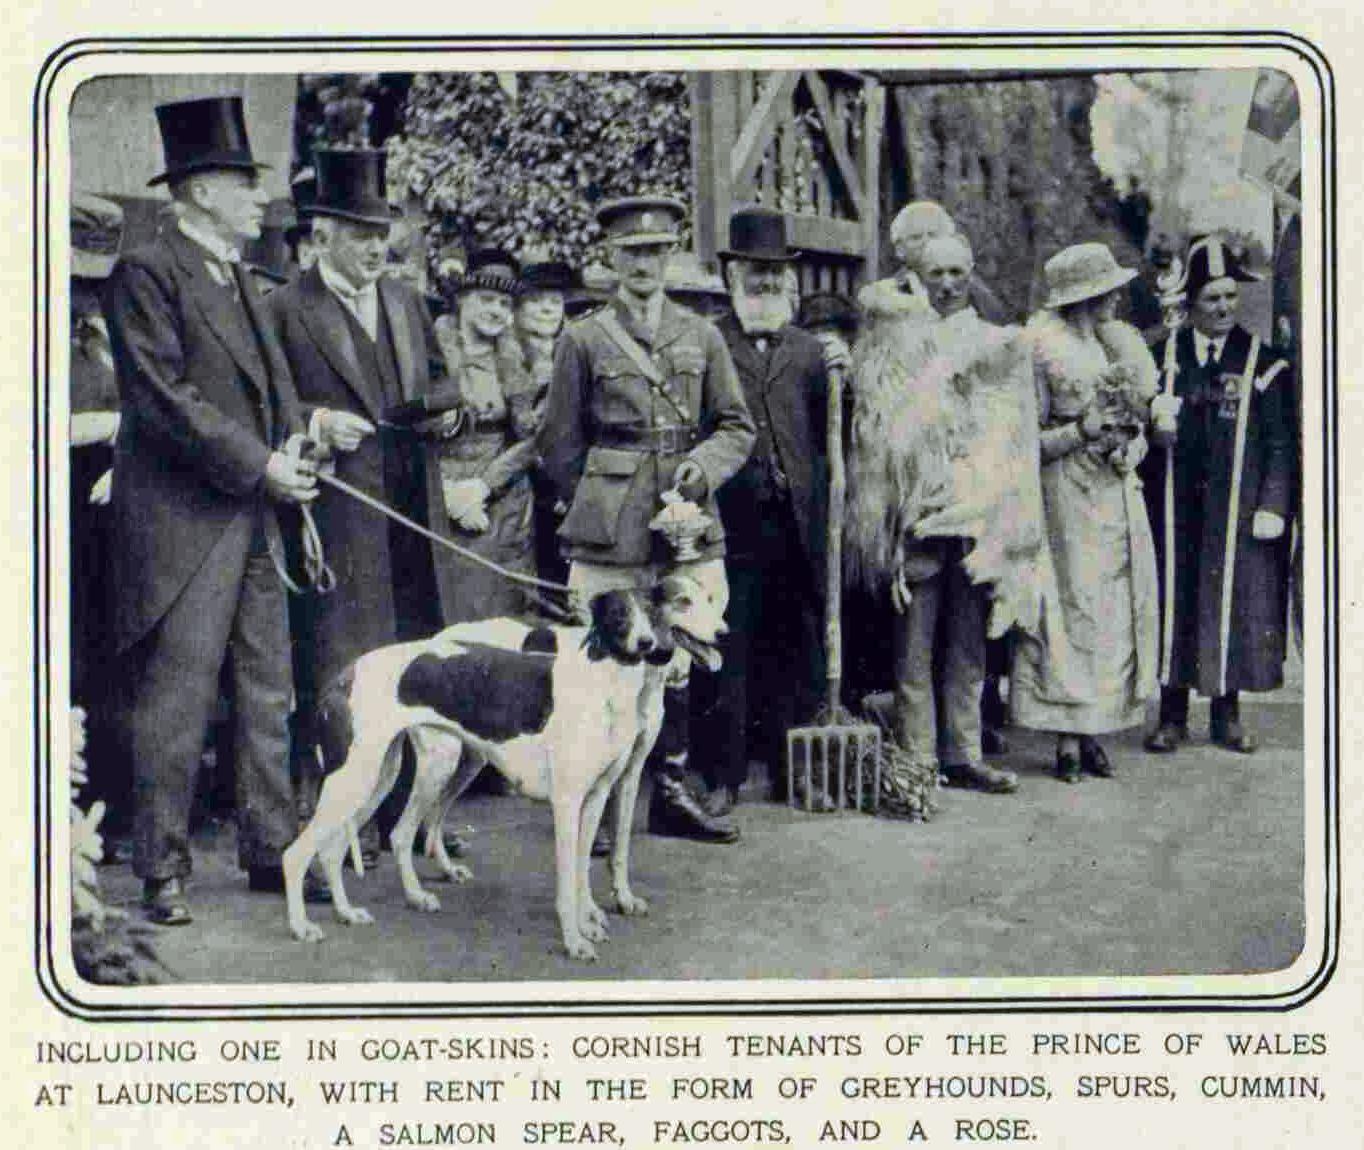 1921 visit of Prince Edward